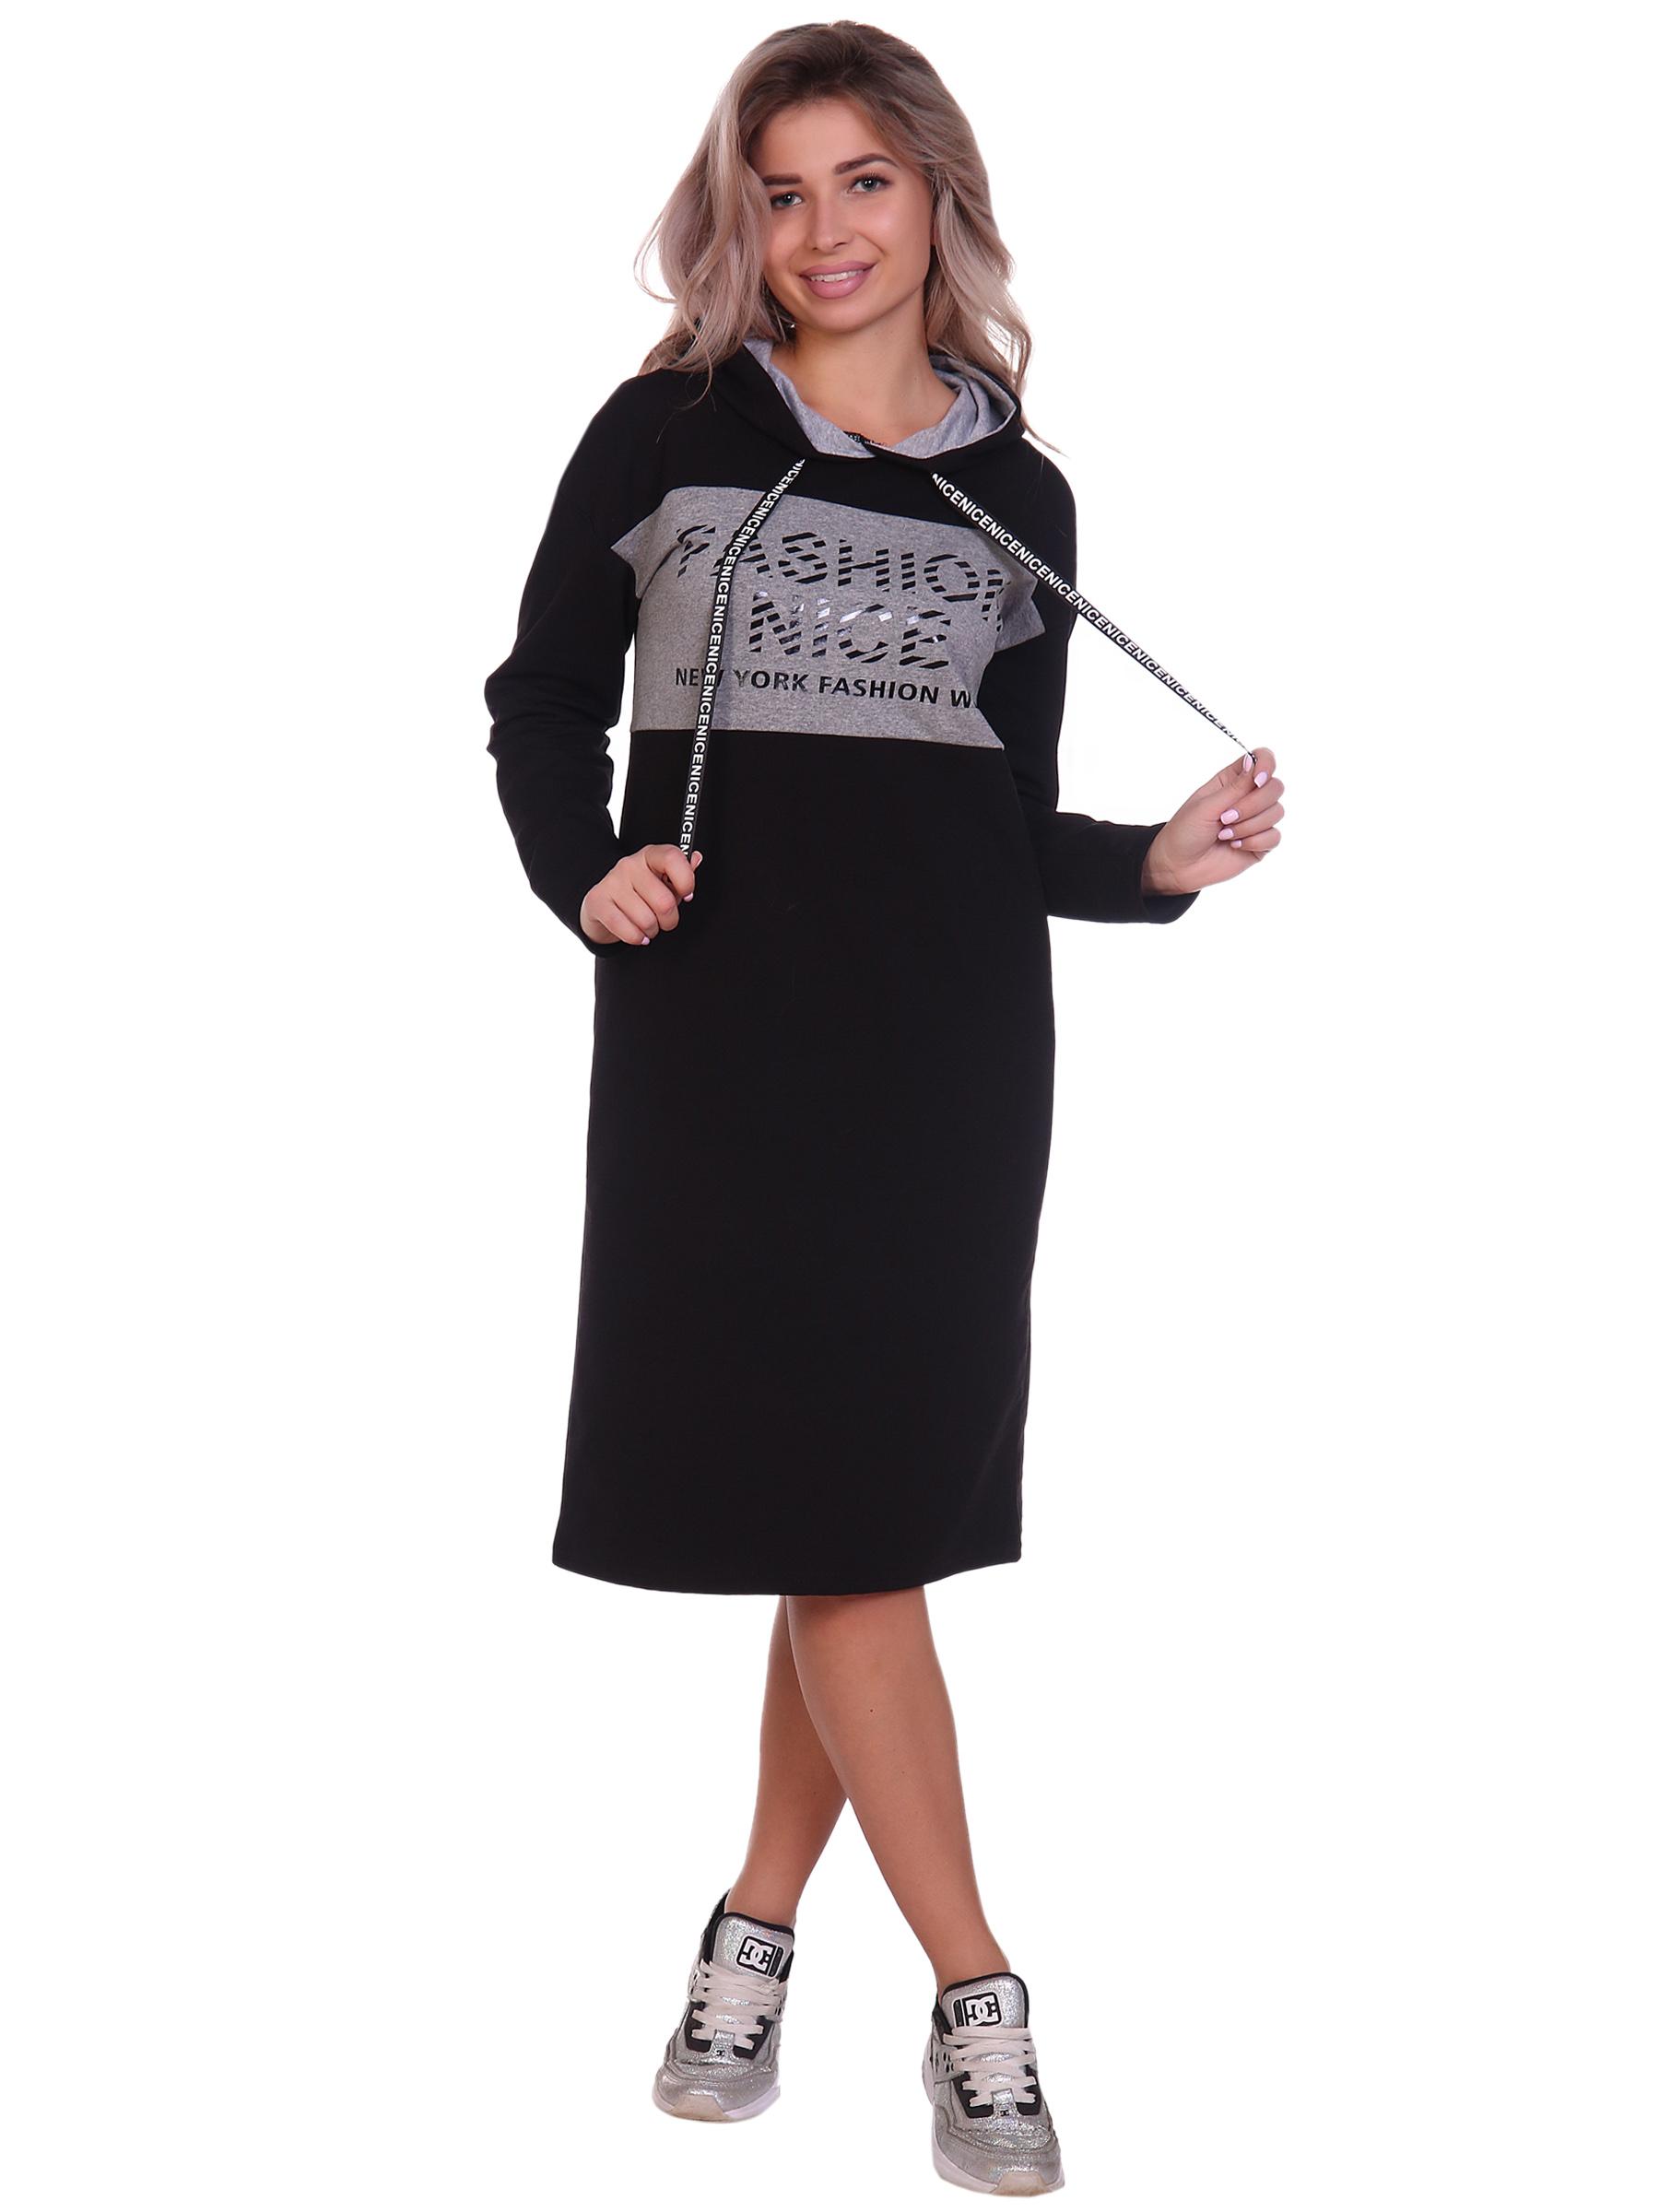 П-018 НСД Платье женское (футер) П-018 НСД